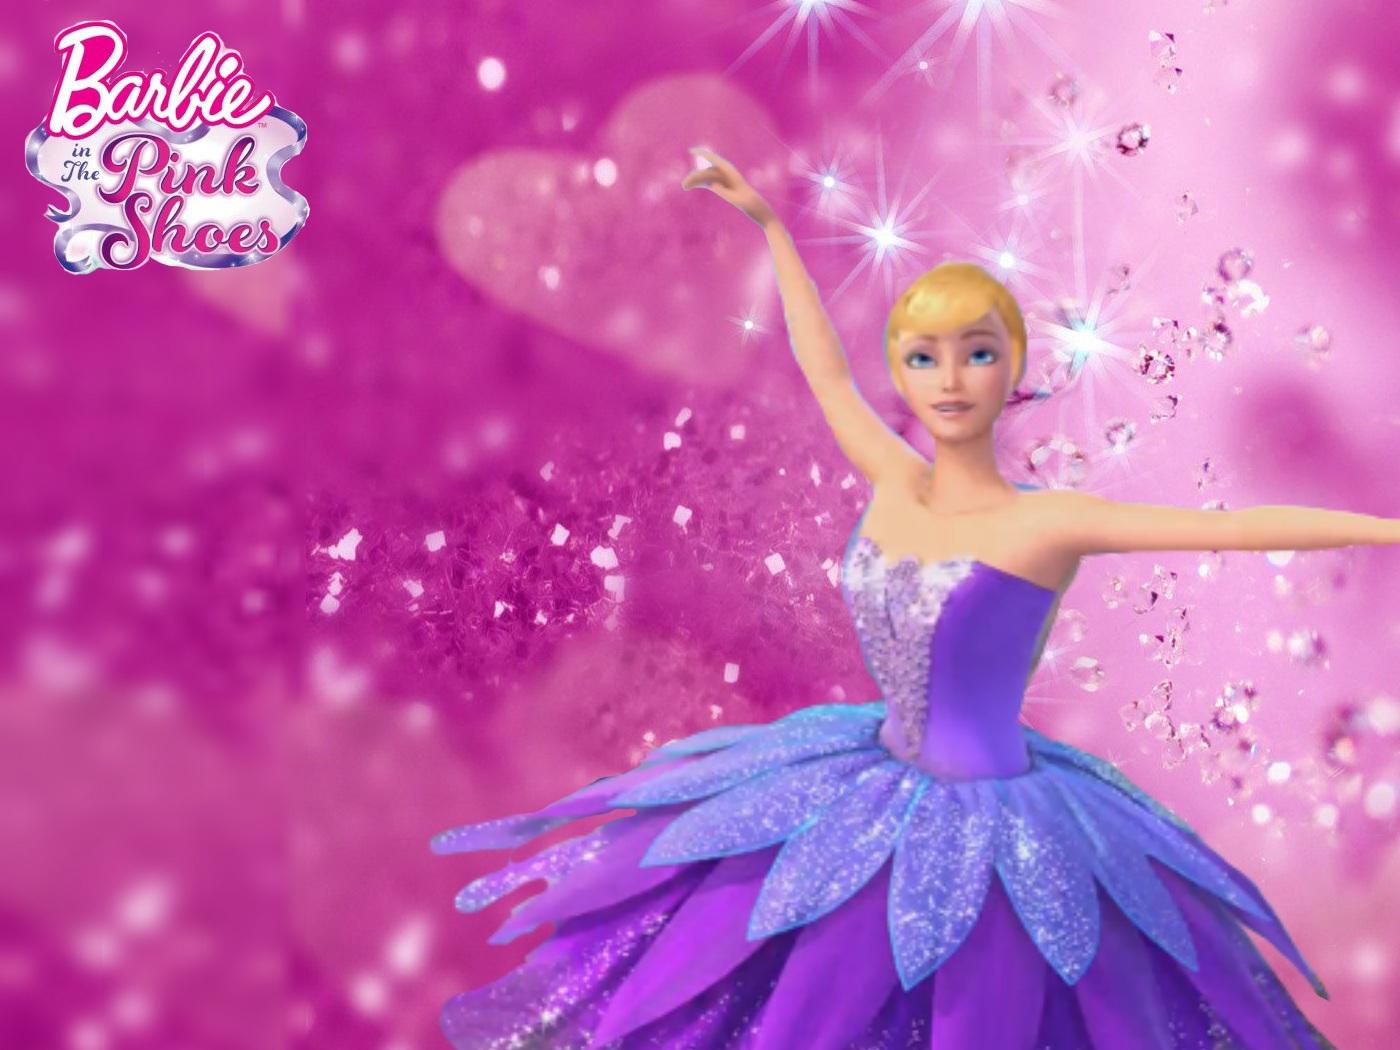 Jessoweys Fave Barbie And Disney Picks Images Kristyn